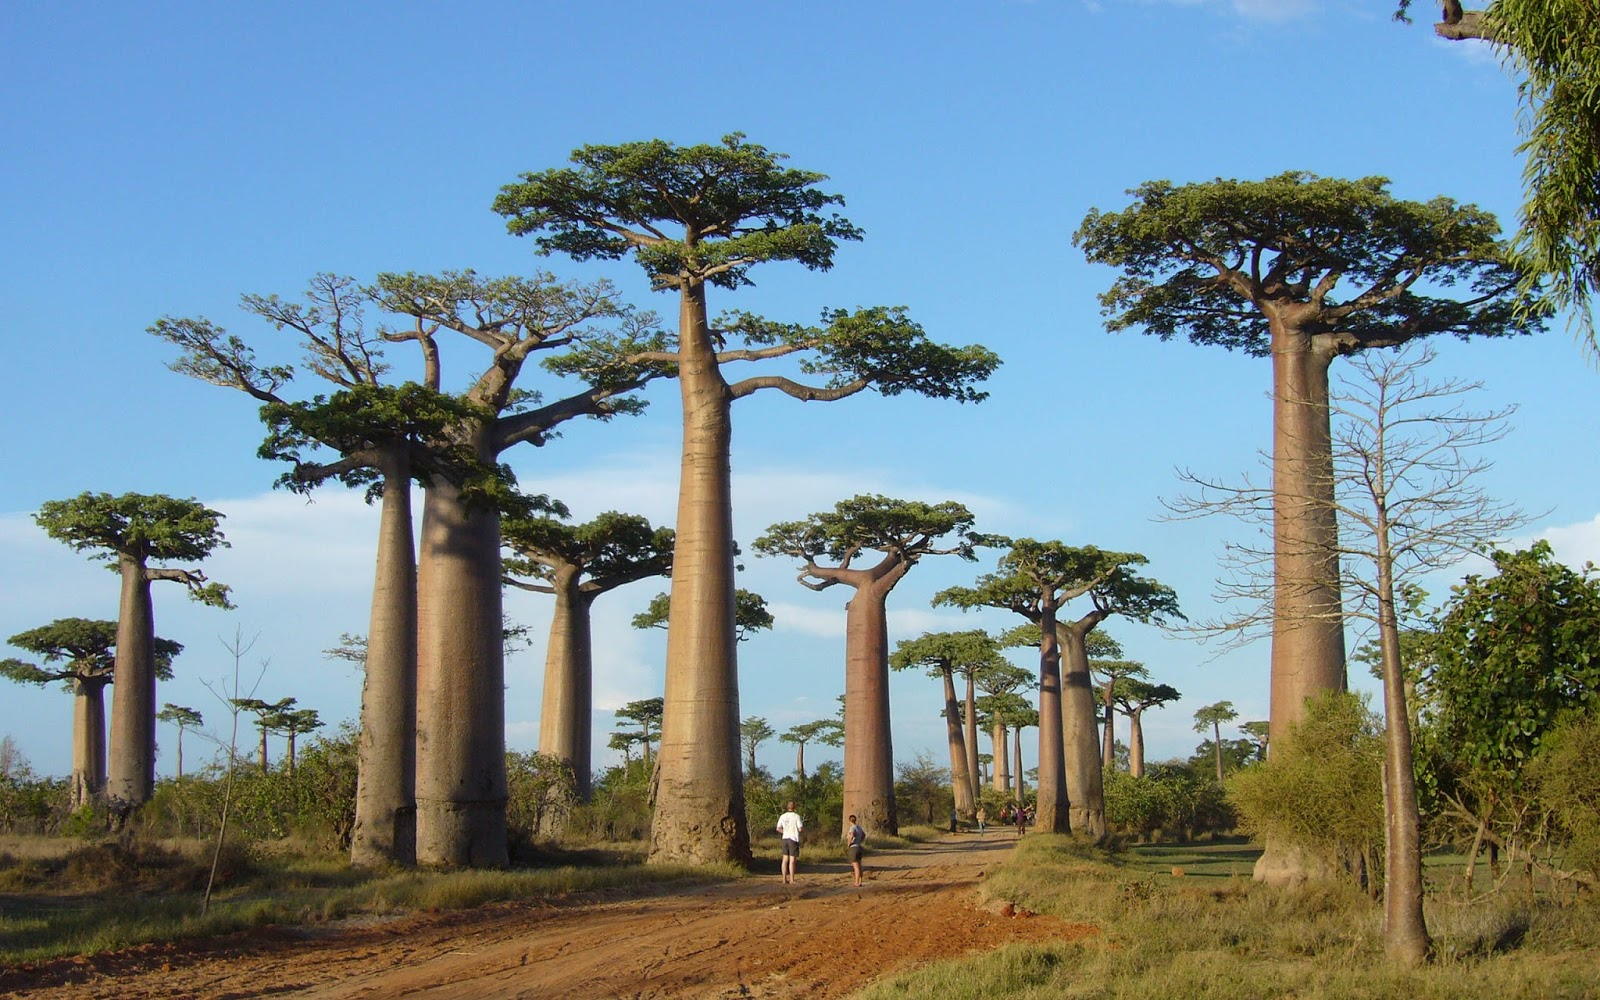 16. Madagascar - 35 Years